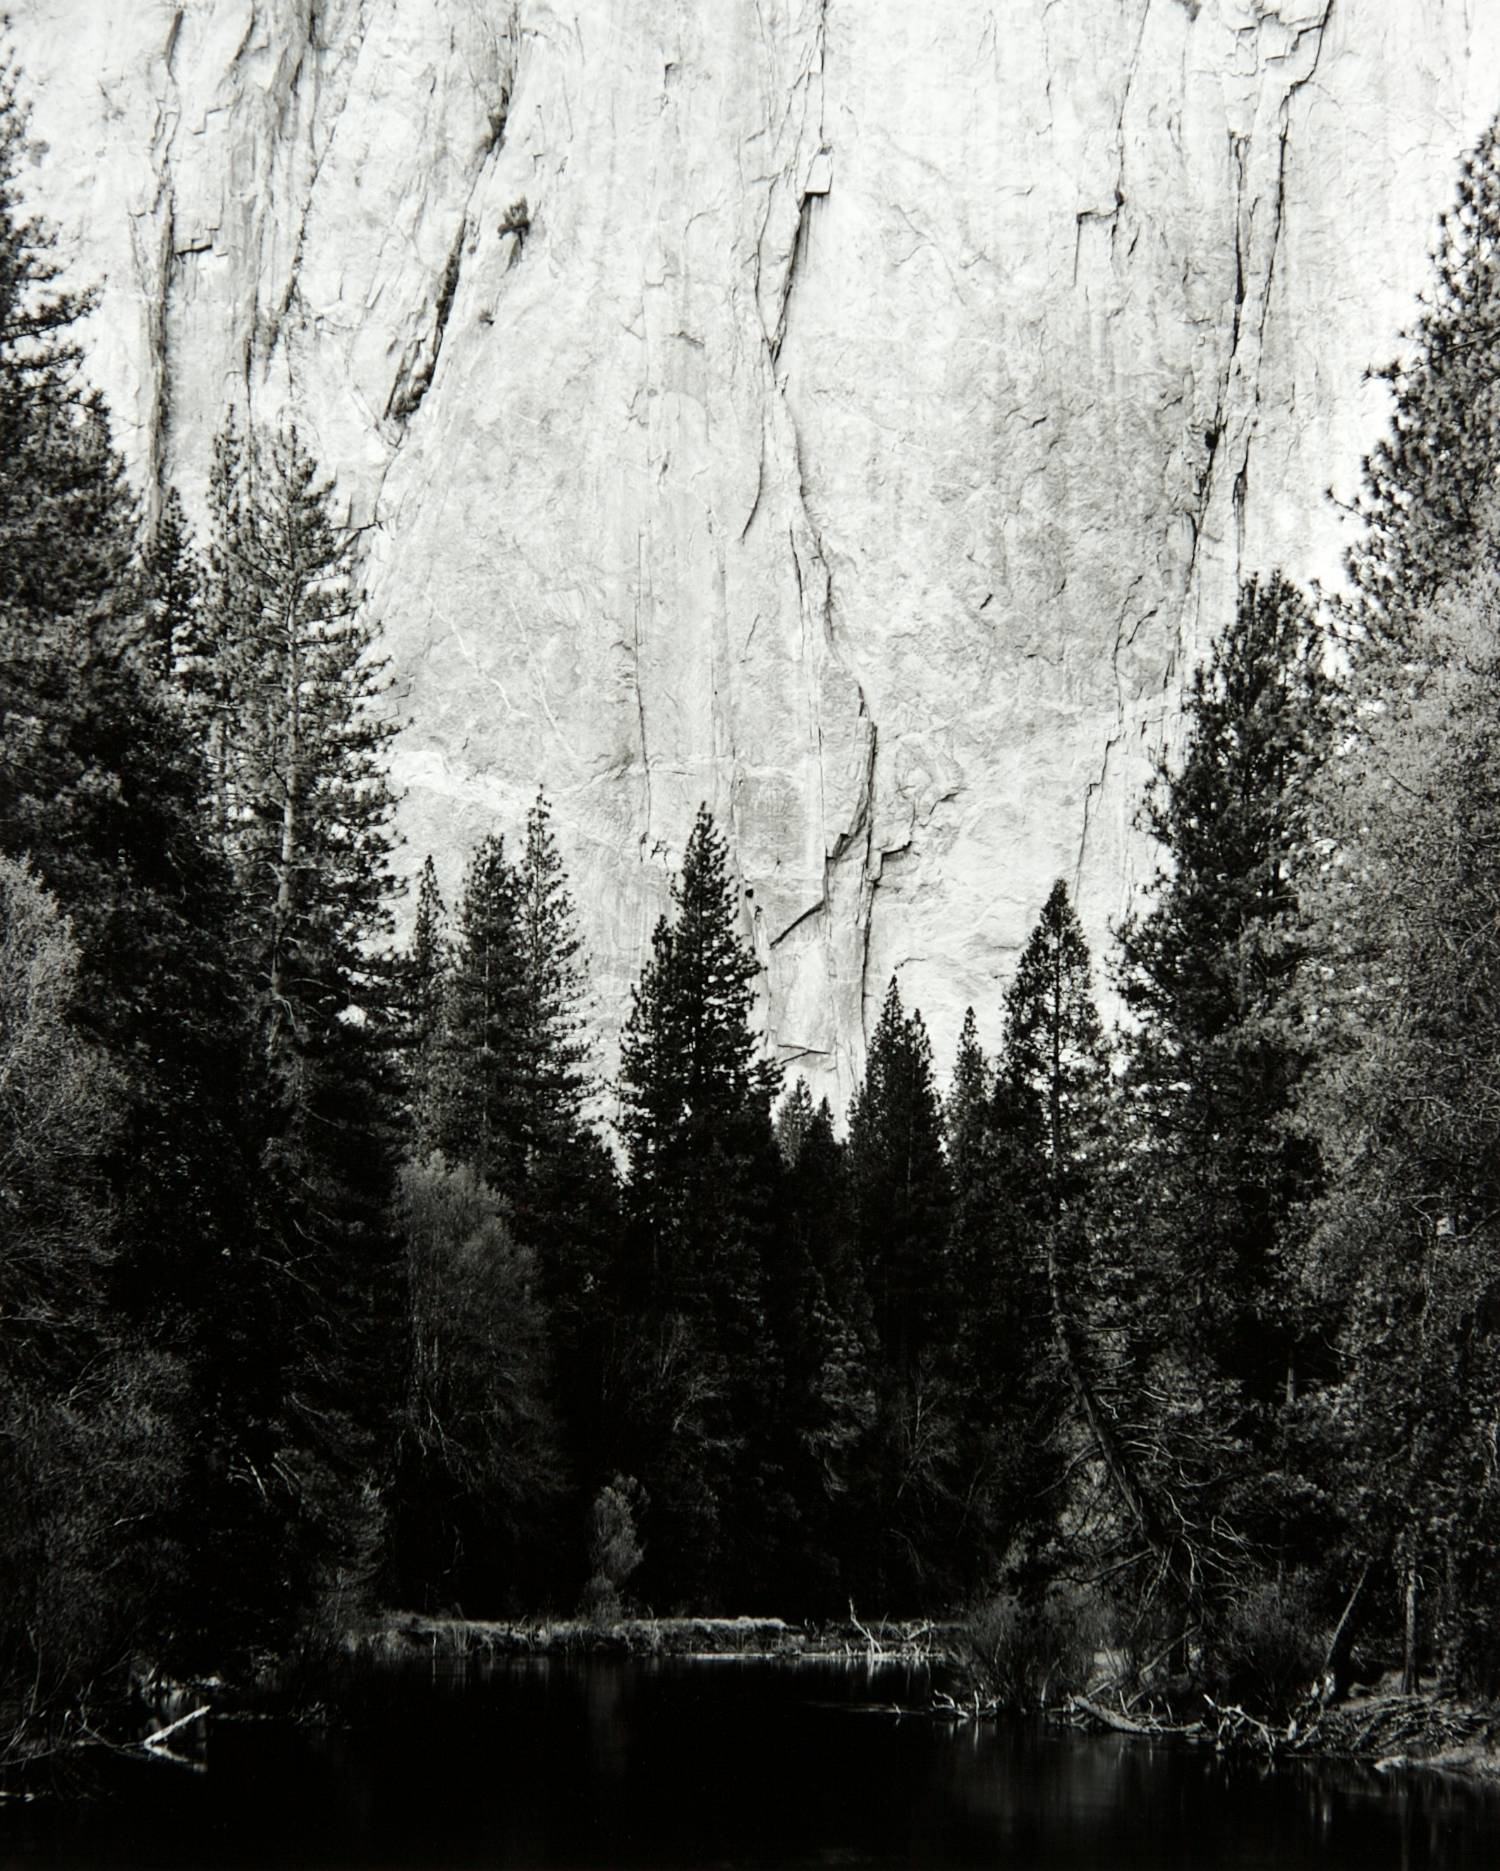 Merced River at Cathedral Spires (Yosemite National Park)